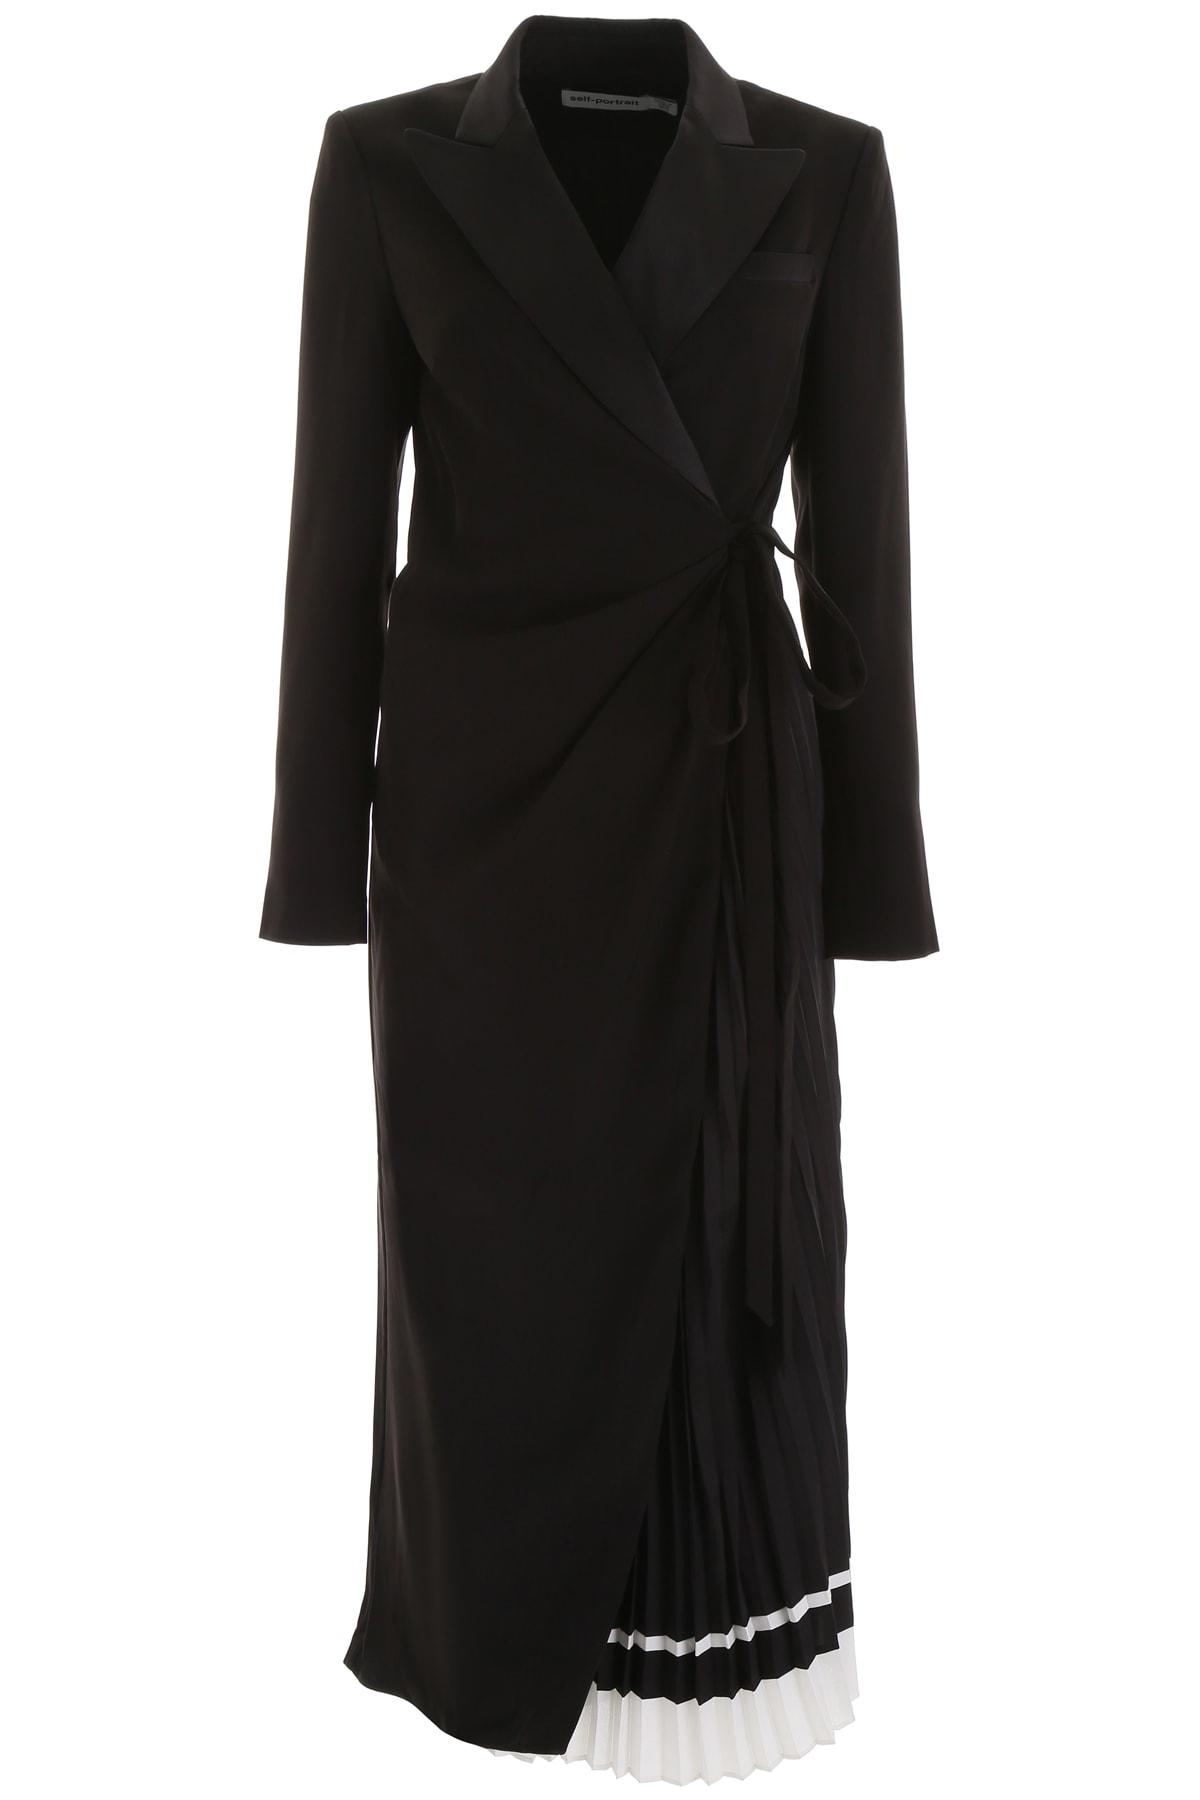 self-portrait Midi Wrap Dress